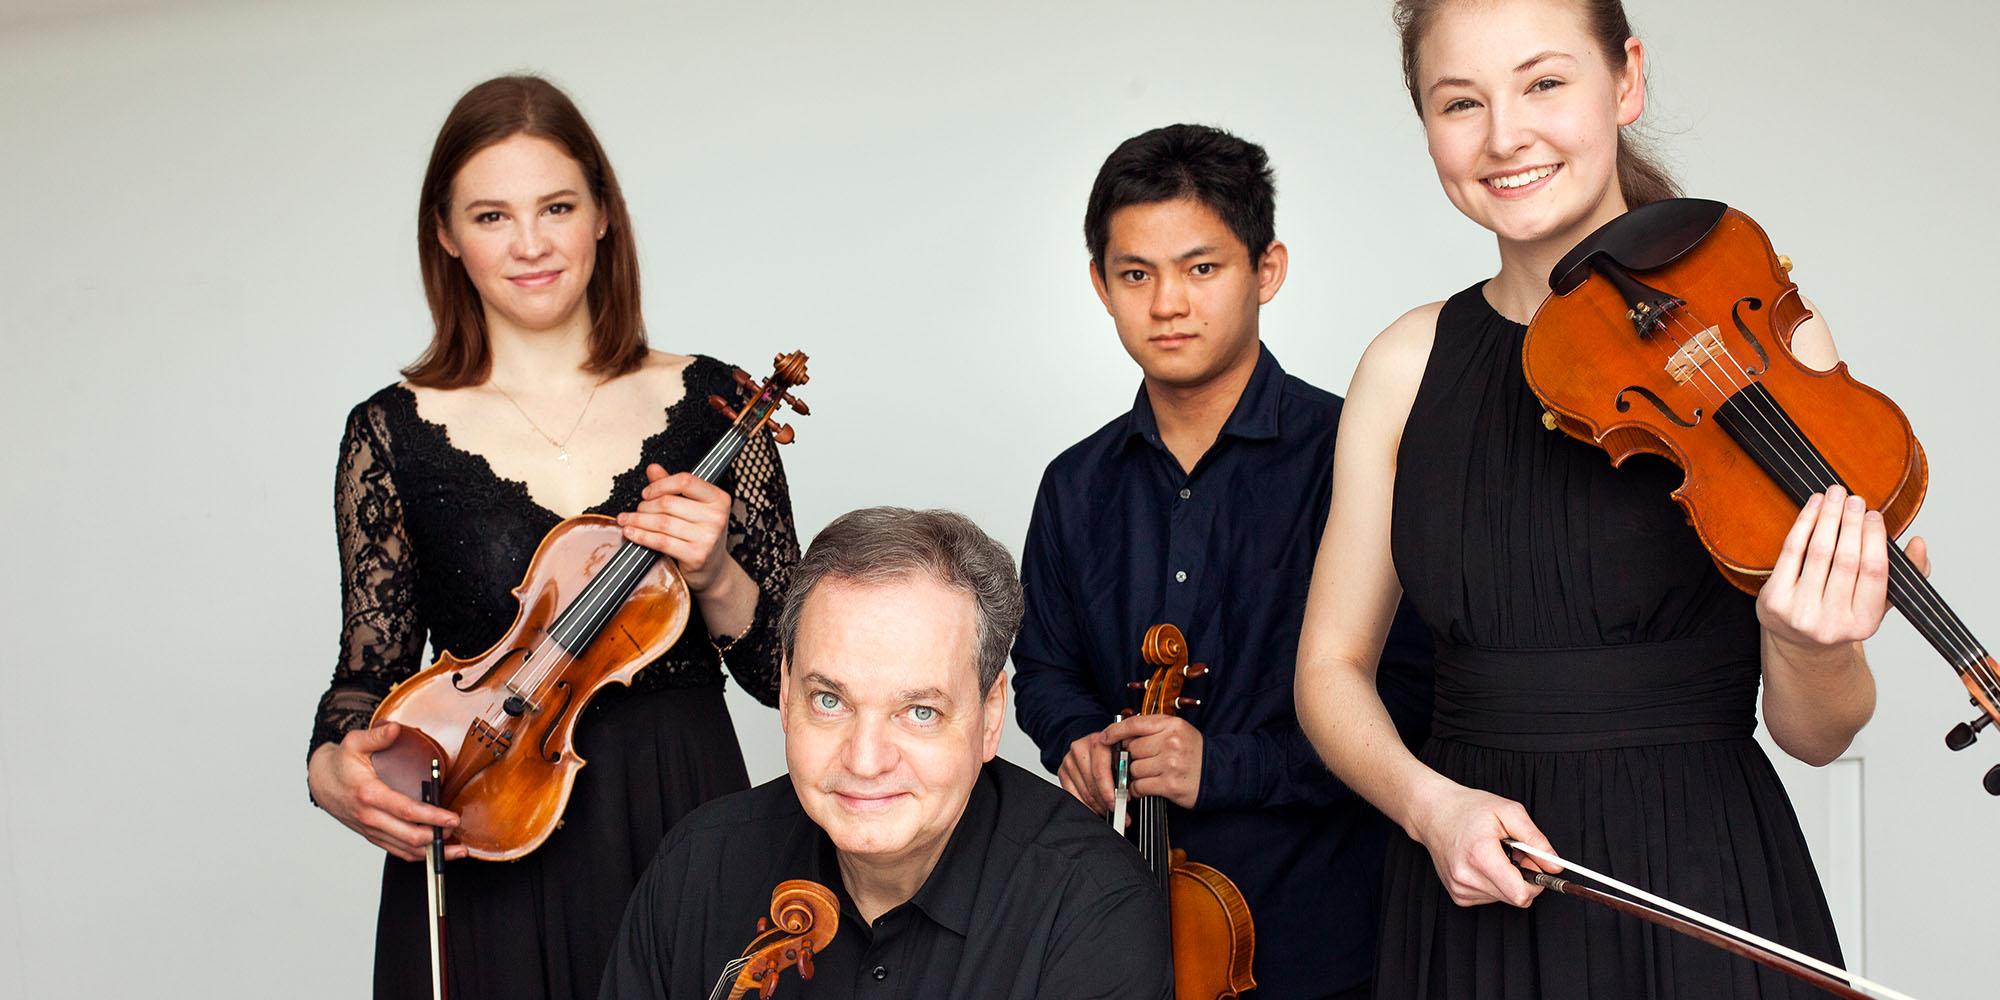 Christian Altenburger & Students